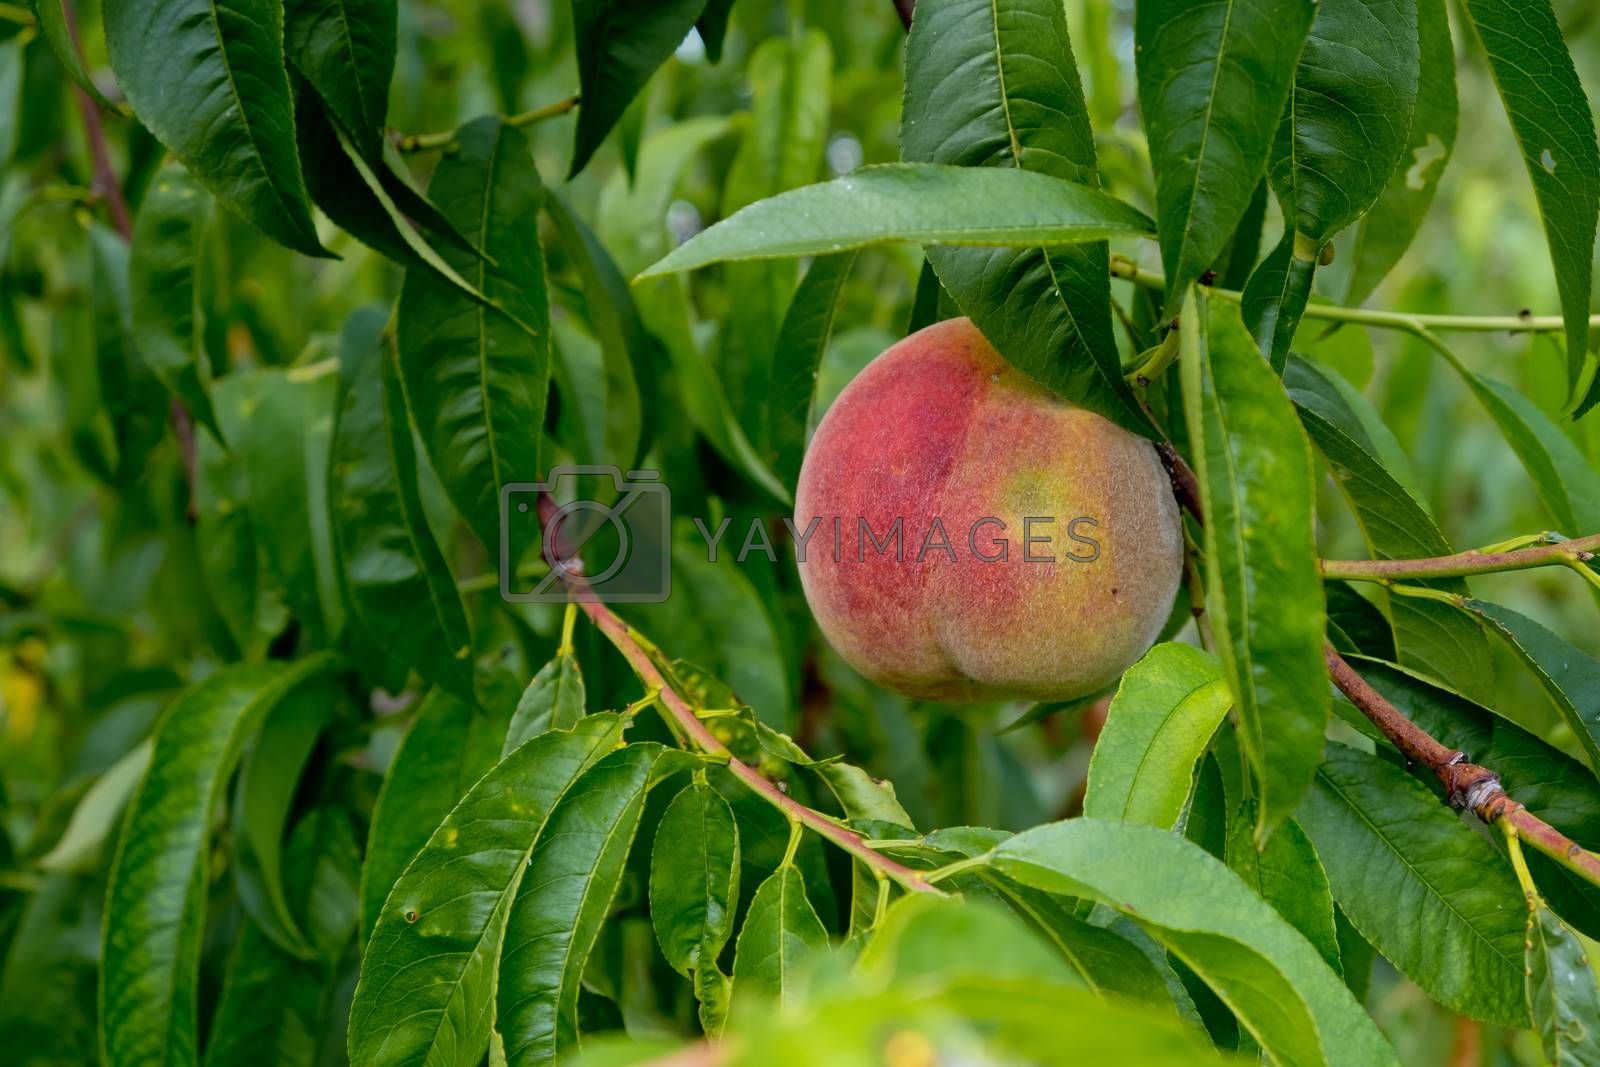 Ripe peach on a tree among the foliage.